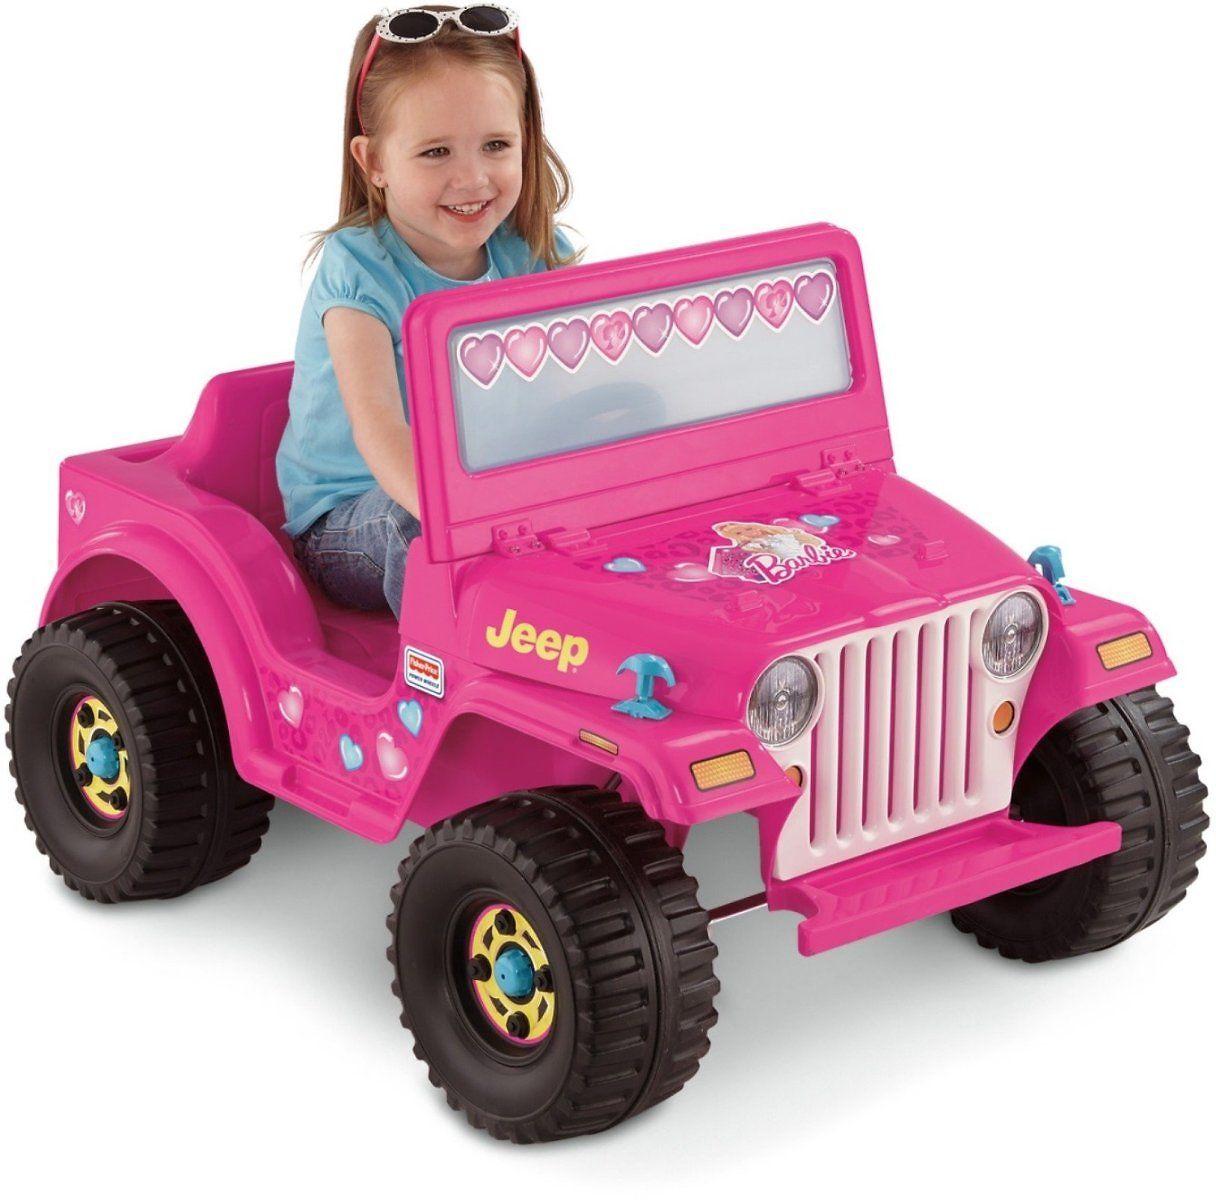 Amazon offers power wheels barbie jeep wrangler for free